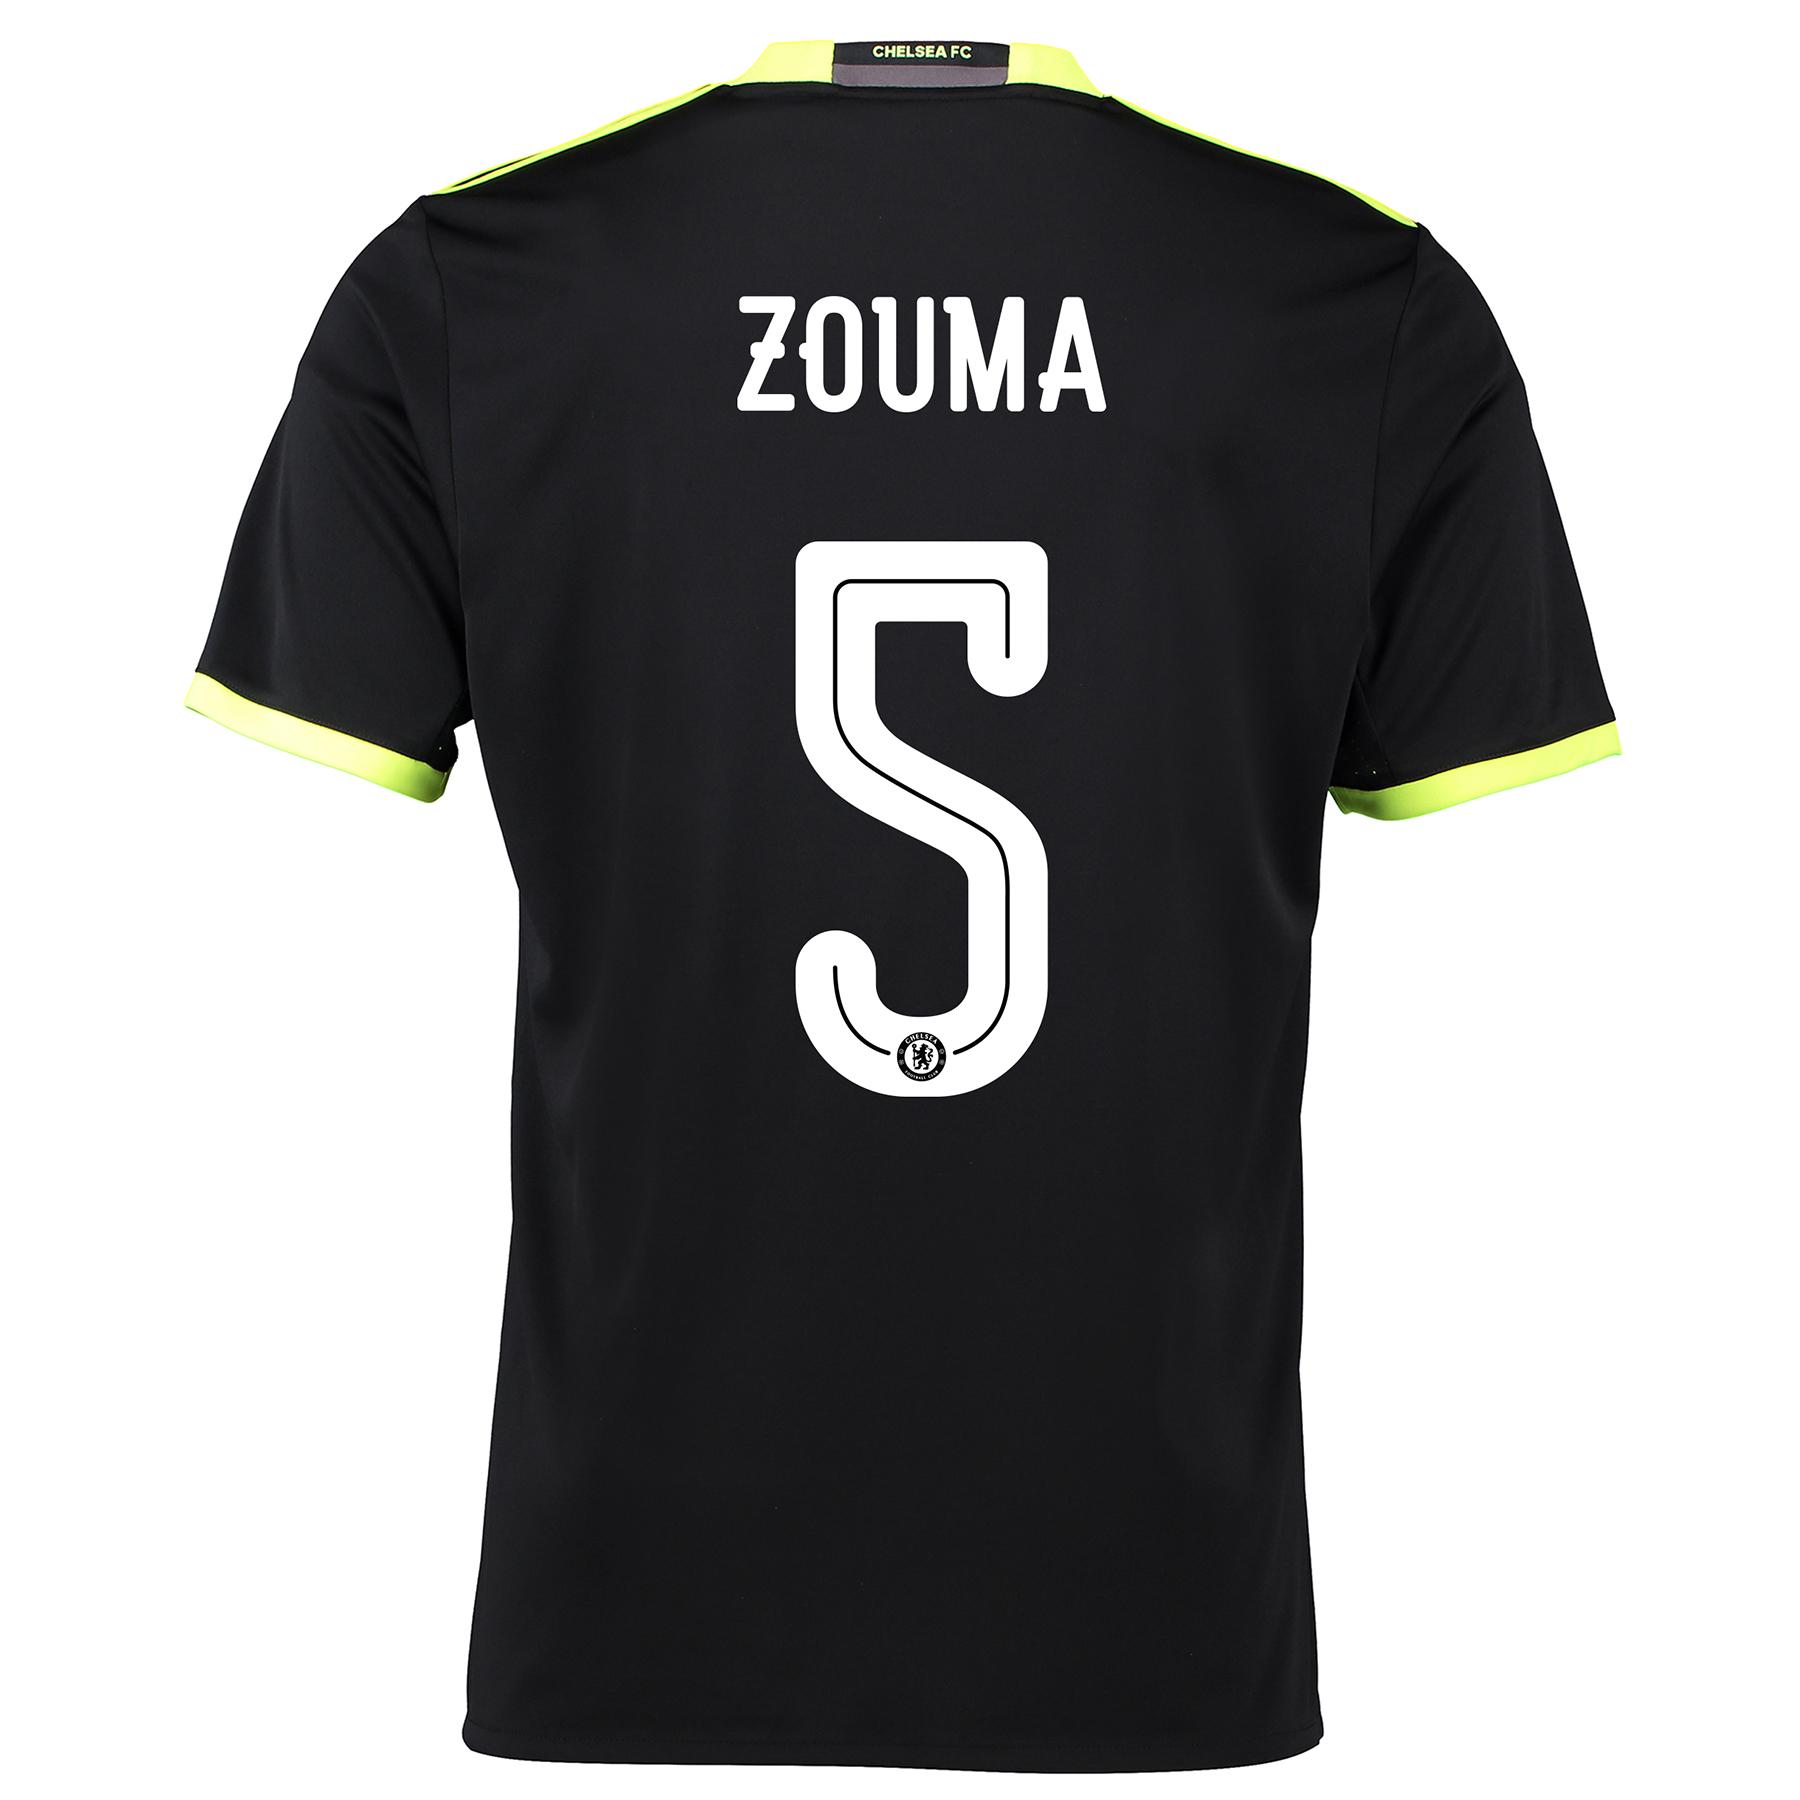 Chelsea Linear Away Shirt 16-17 with ZOUMA 5 printing